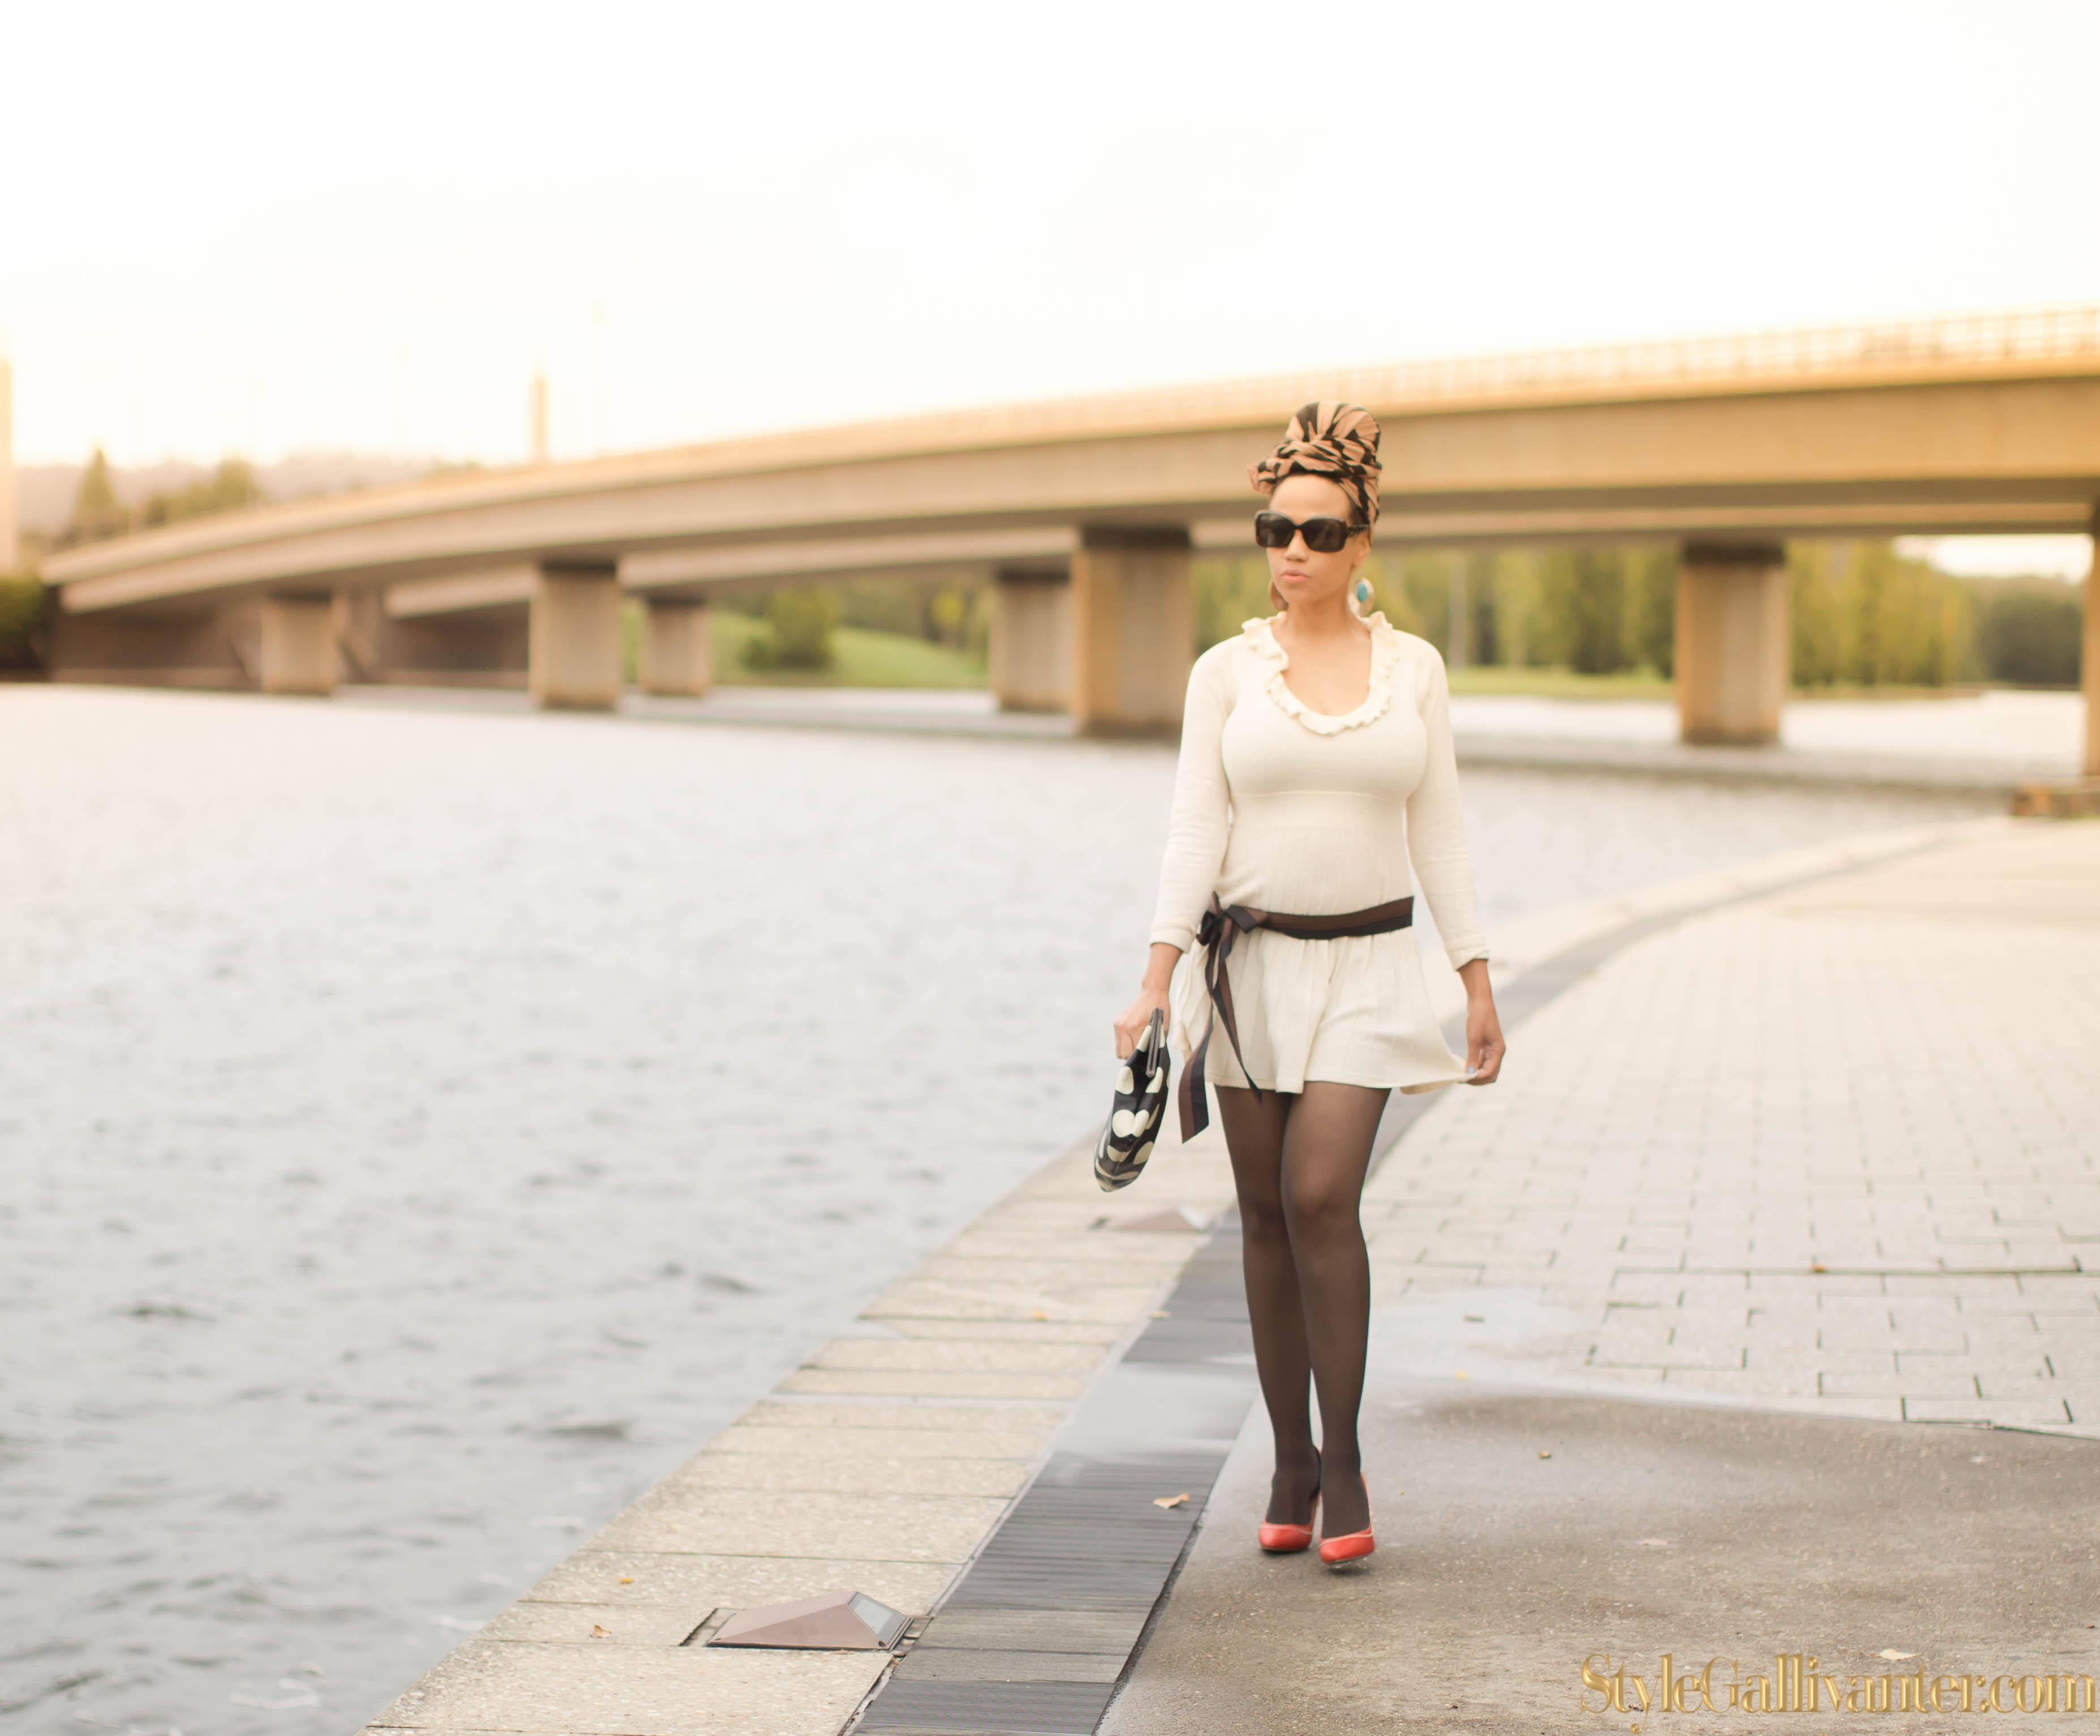 pregnant-fashion-bloggers-melbourne-australia_mummy-bloggers-melbourne_best-bump-models-australia_celebrity-bump-style_best-bump-bloggers_maternity-models-melbourne-18